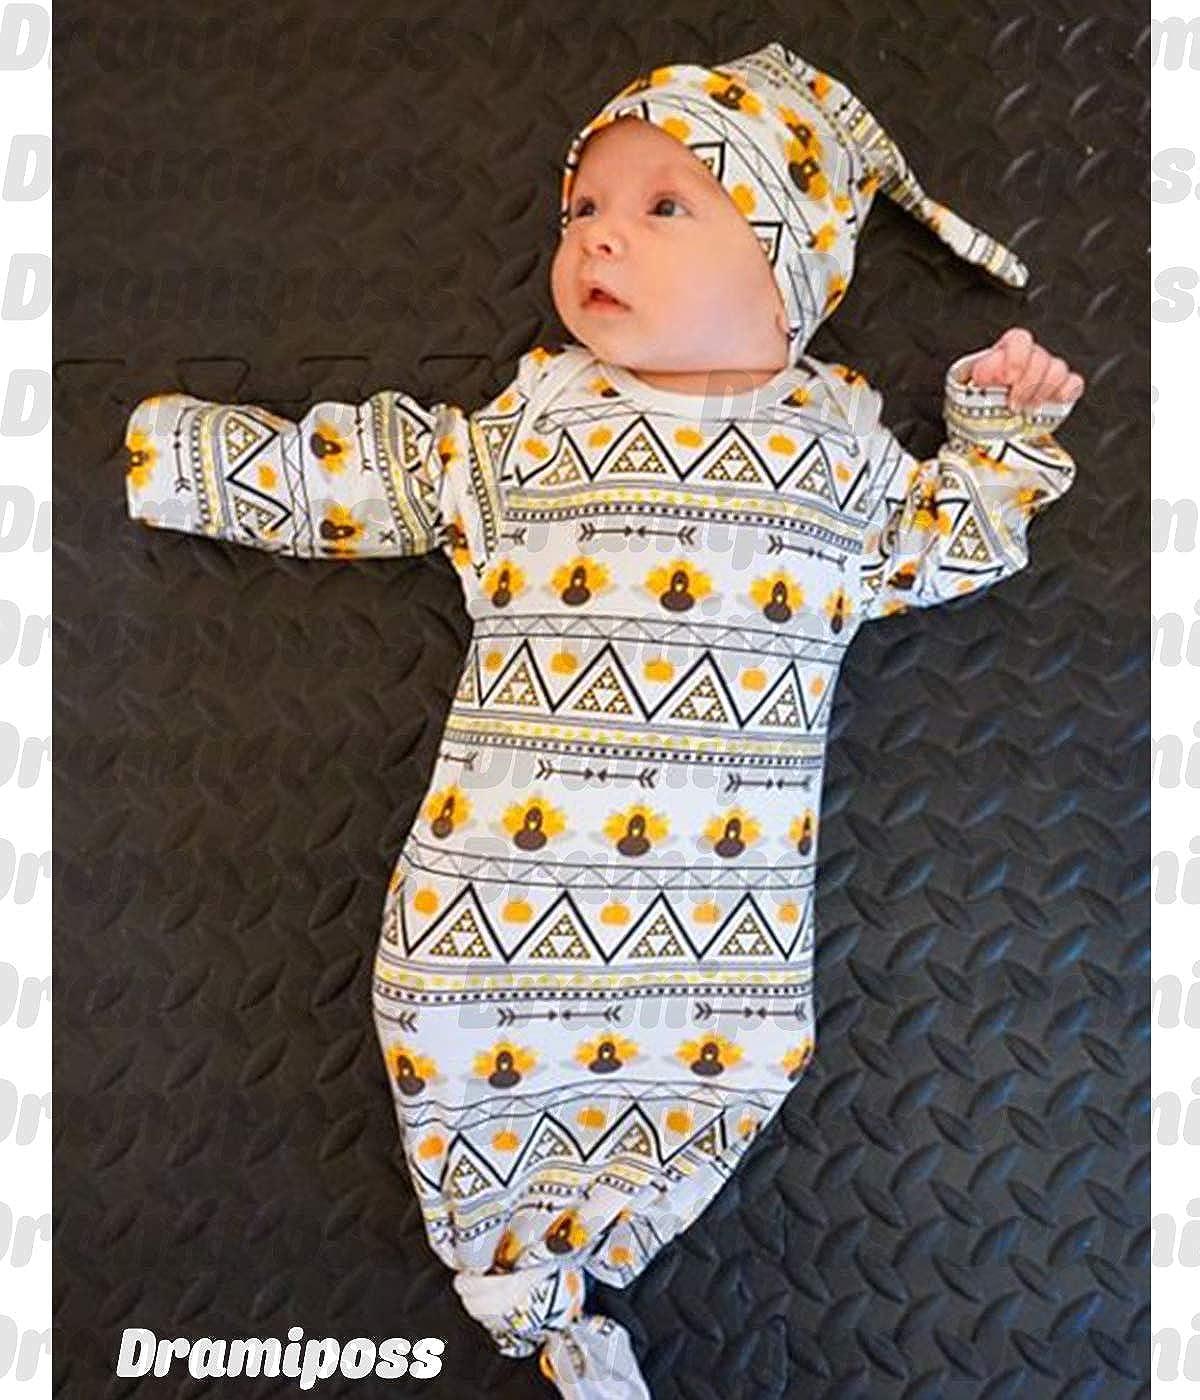 Dramiposs 3Pcs Newborn Baby Boys Girls Knotted Nightgown Cotton Sleepwear (White,3-6 Months)